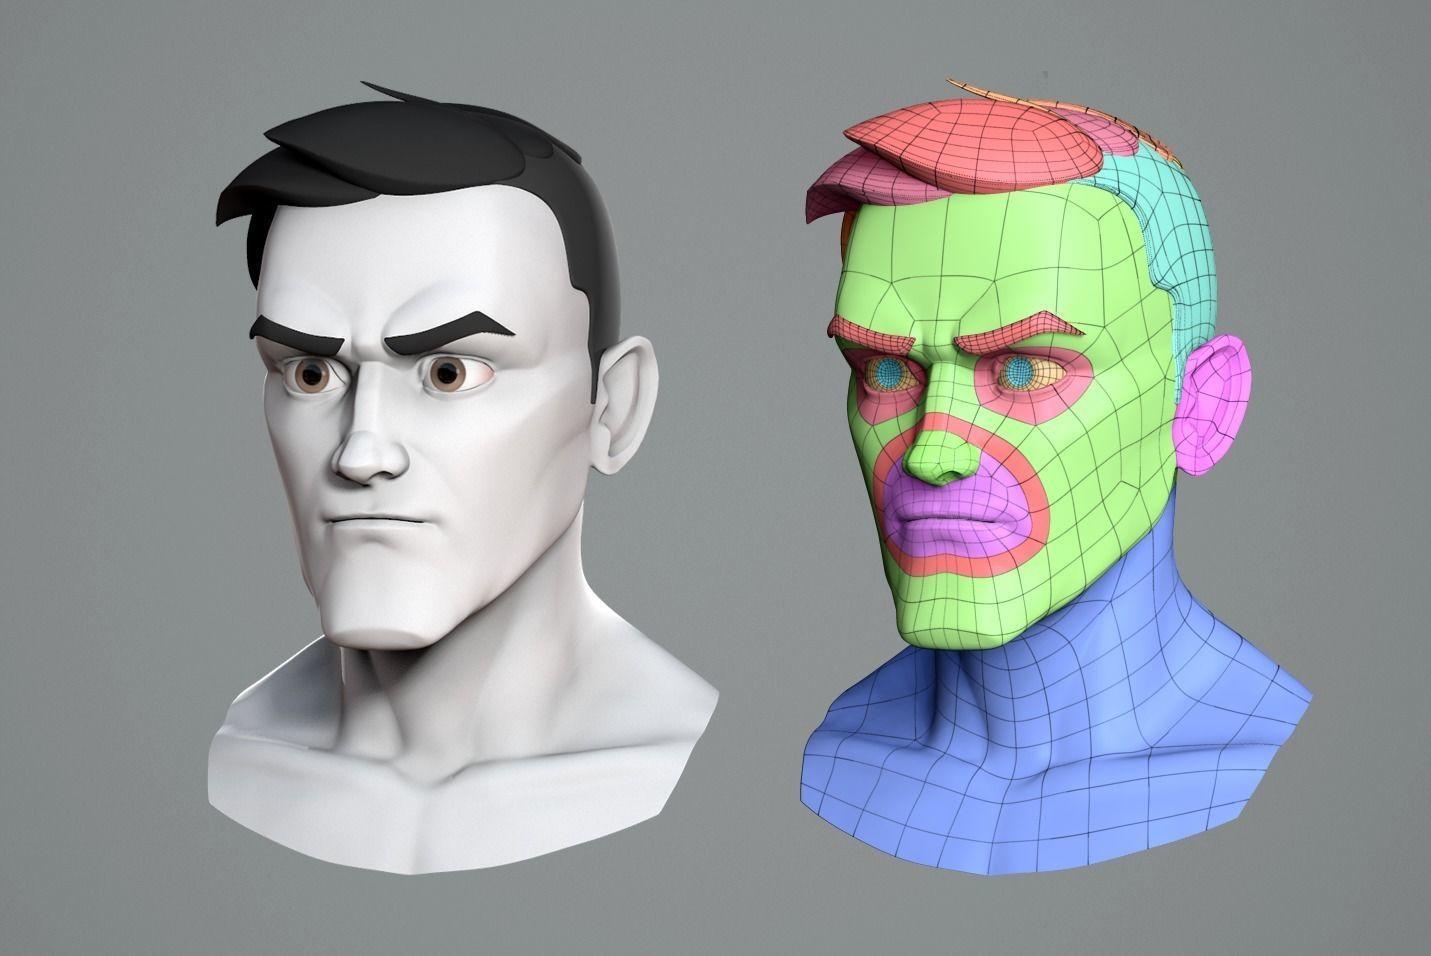 Male cartoon character base mesh